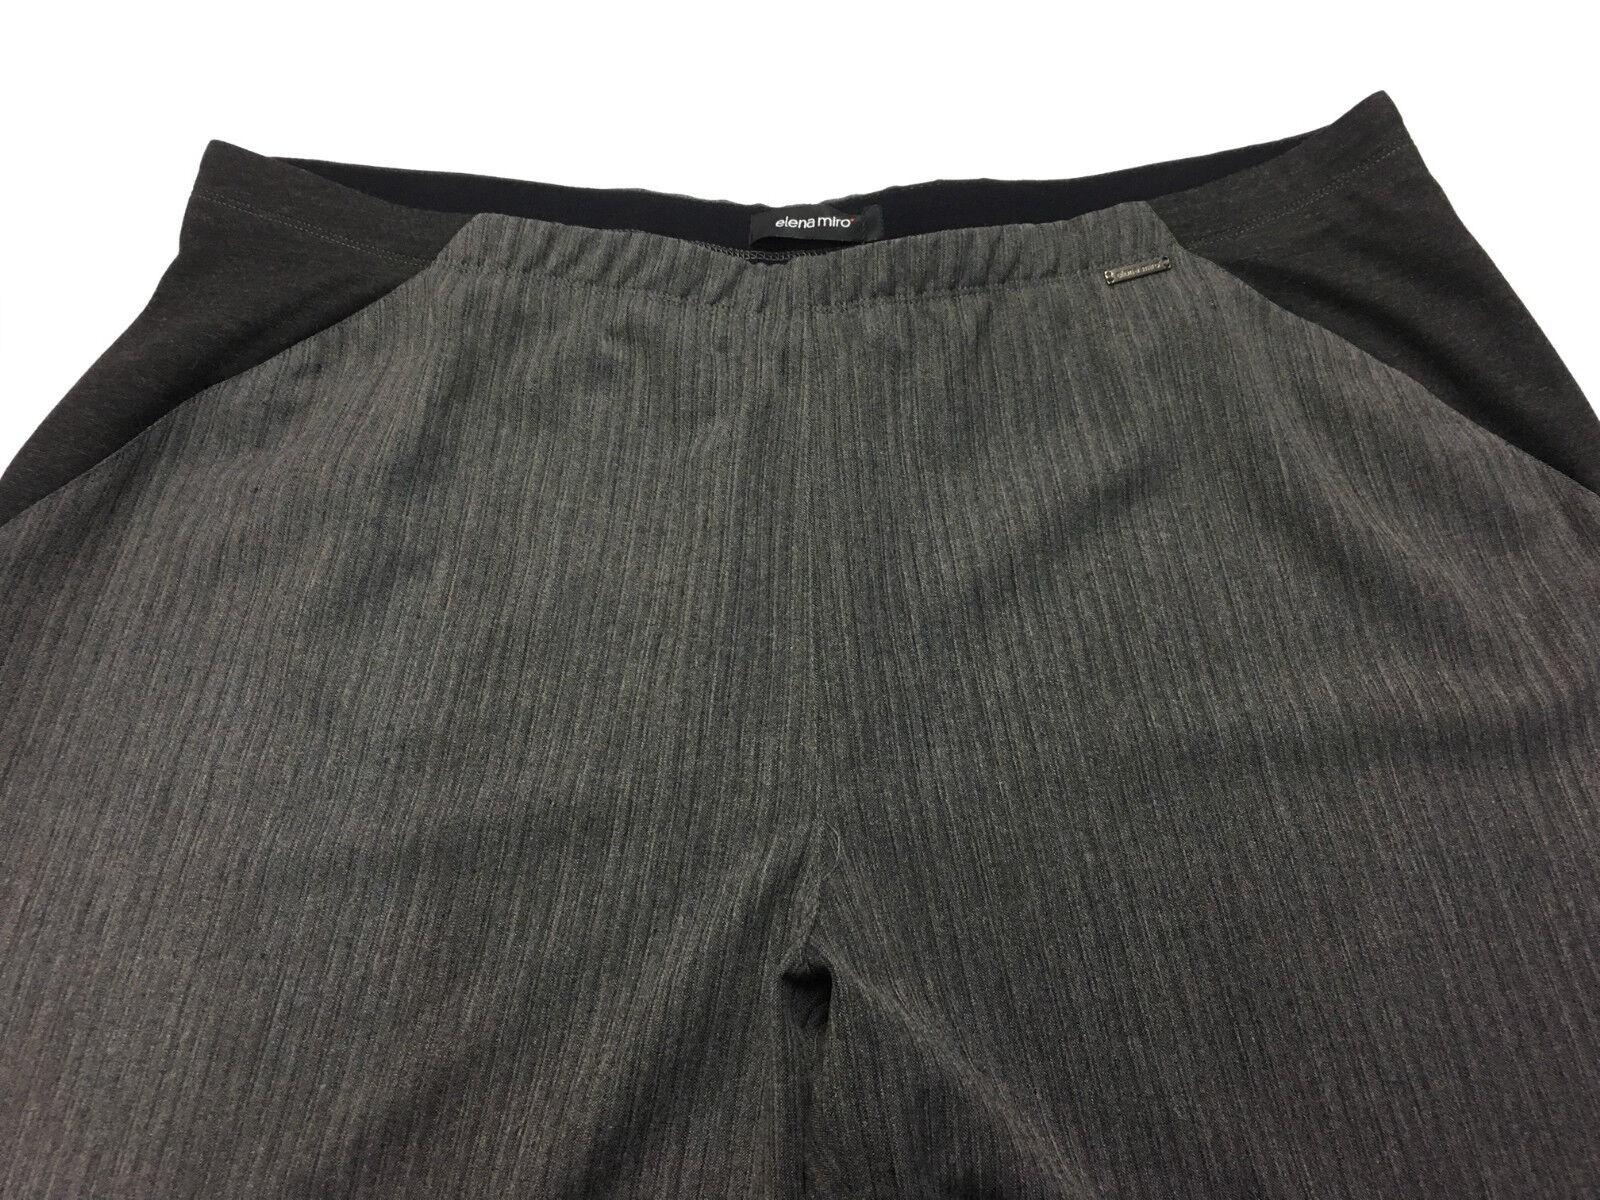 ELENA MIRO' Damenhose grau grau grau Nadelstreifen mit elastisch 68% Polyester 705abc